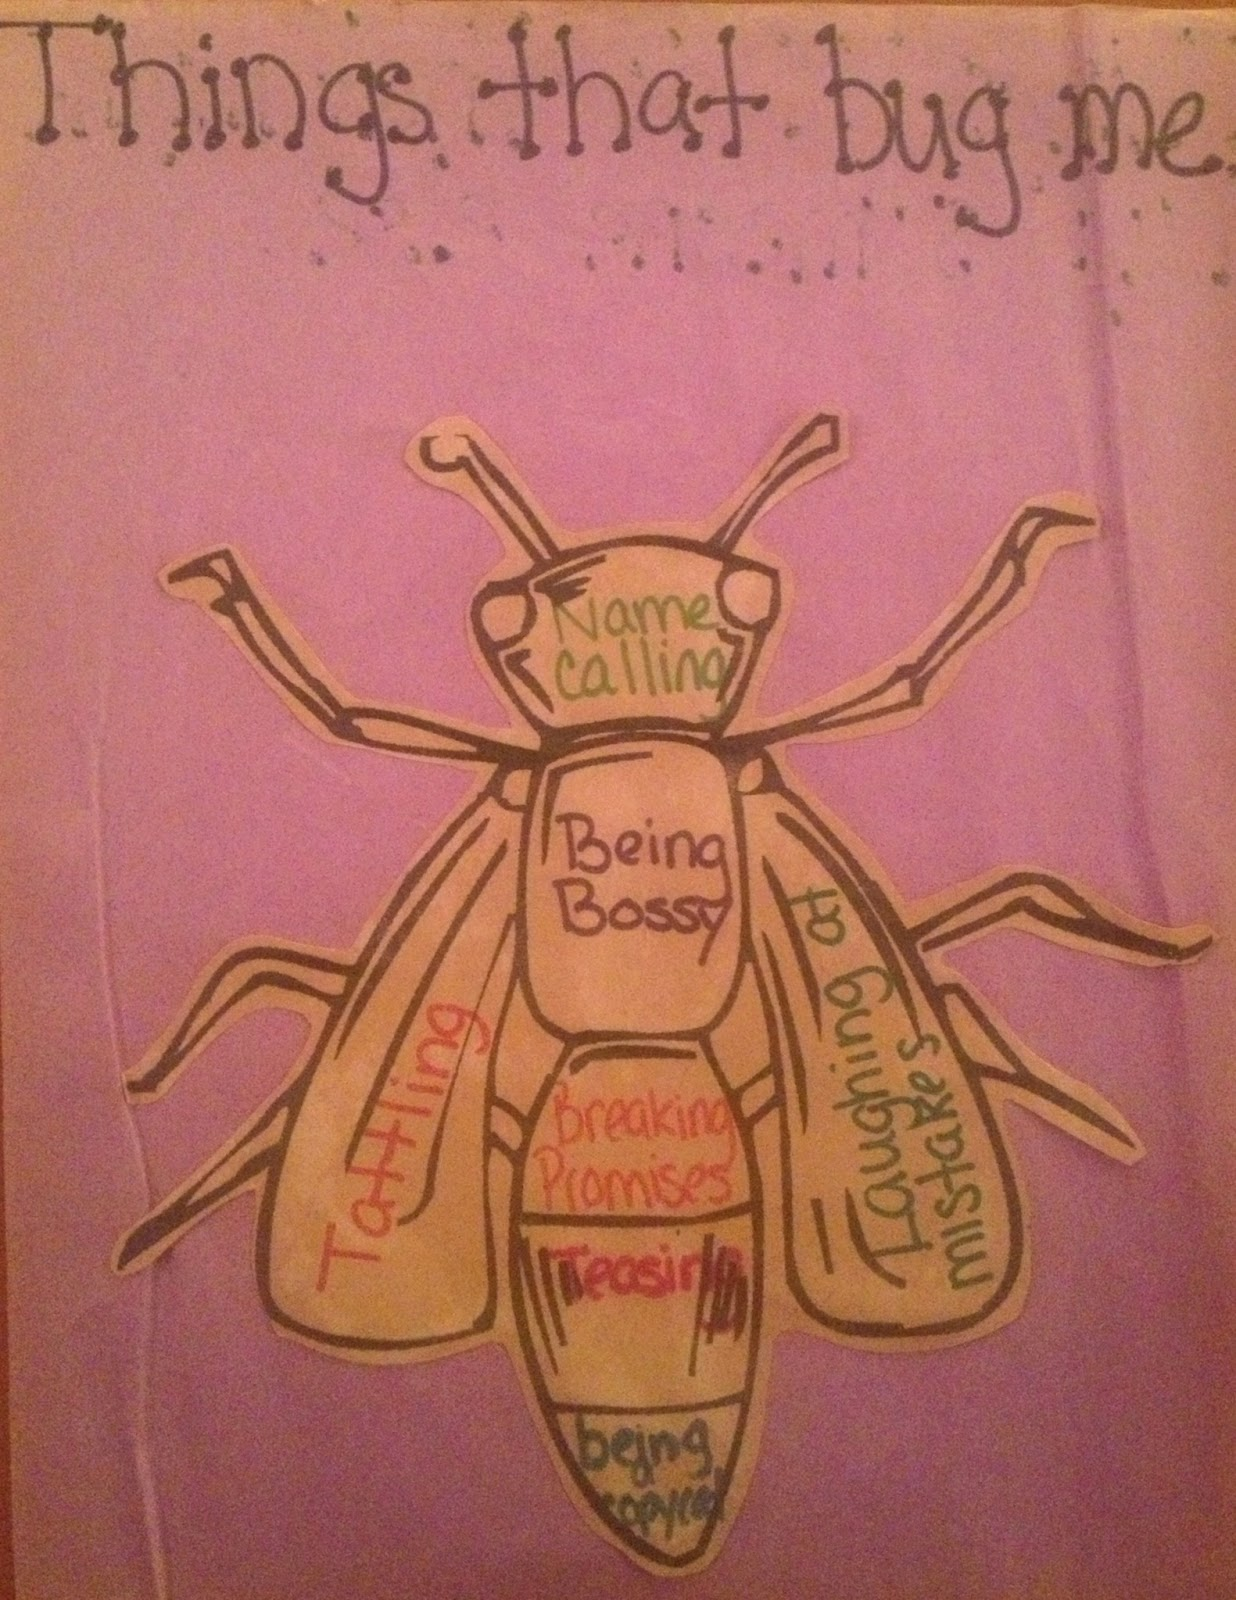 Creative Elementary School Counselor Friendship Bugs